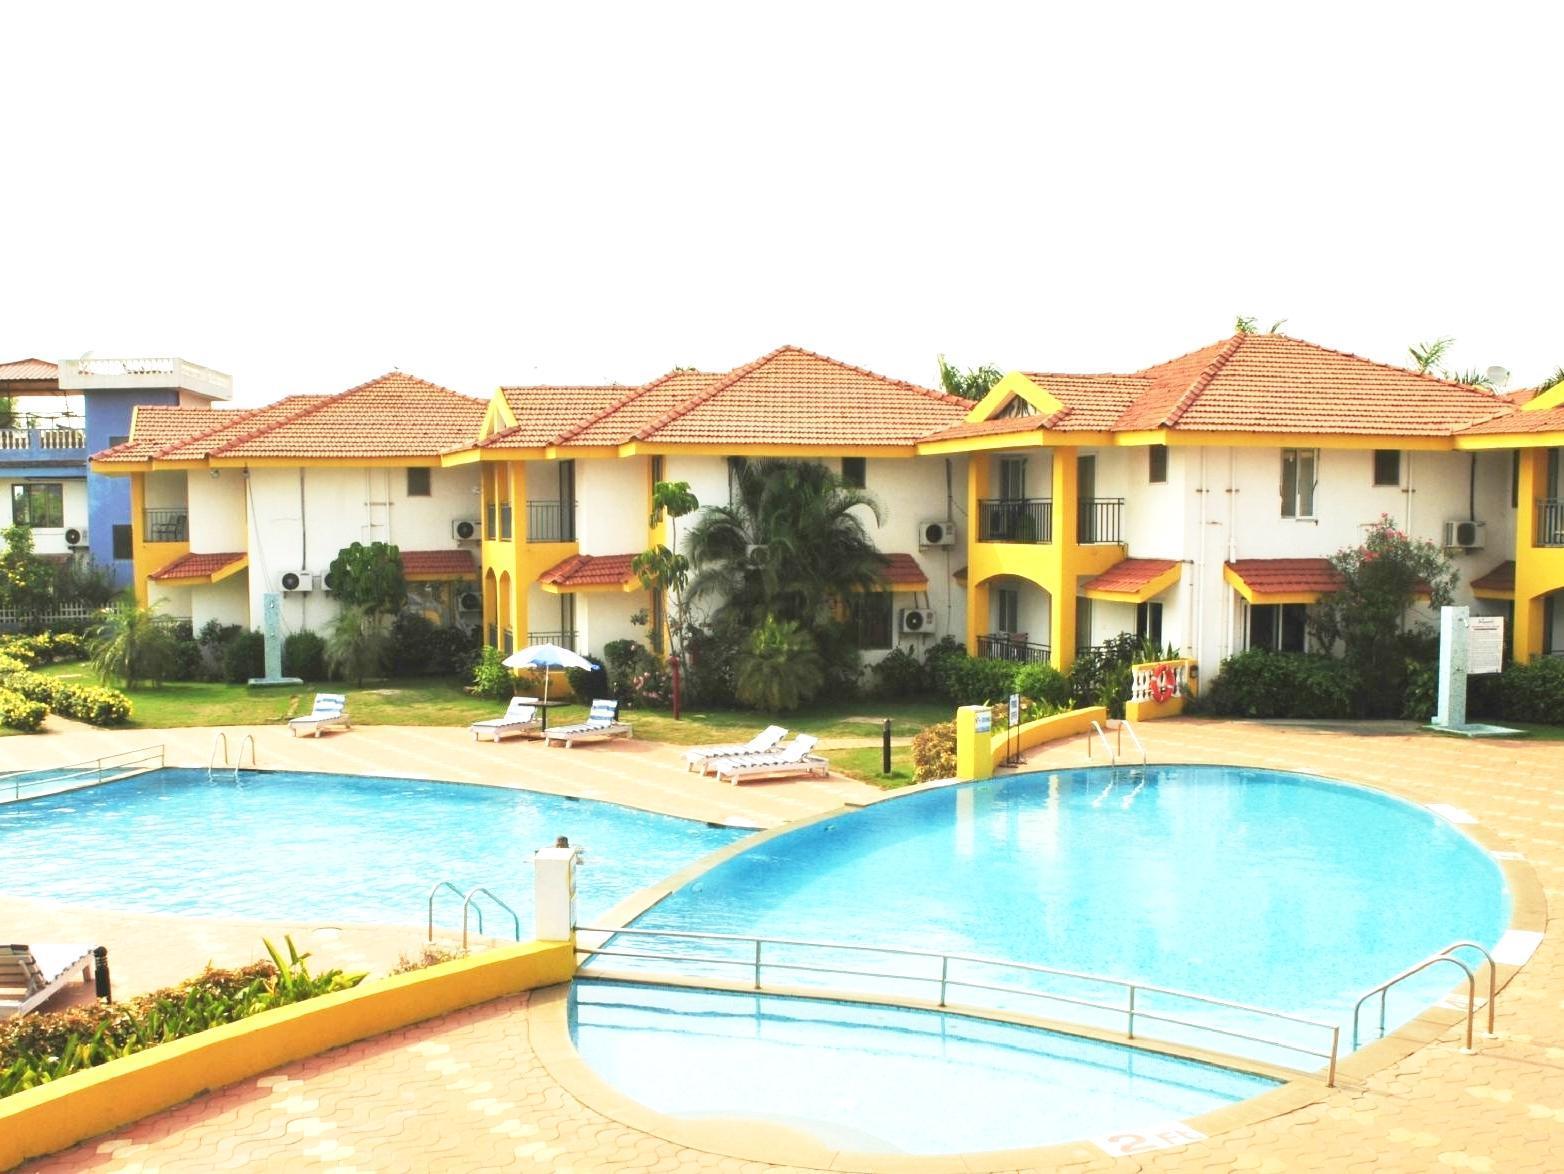 Hotel Sun Village 4 Goa: cheap and cheerful